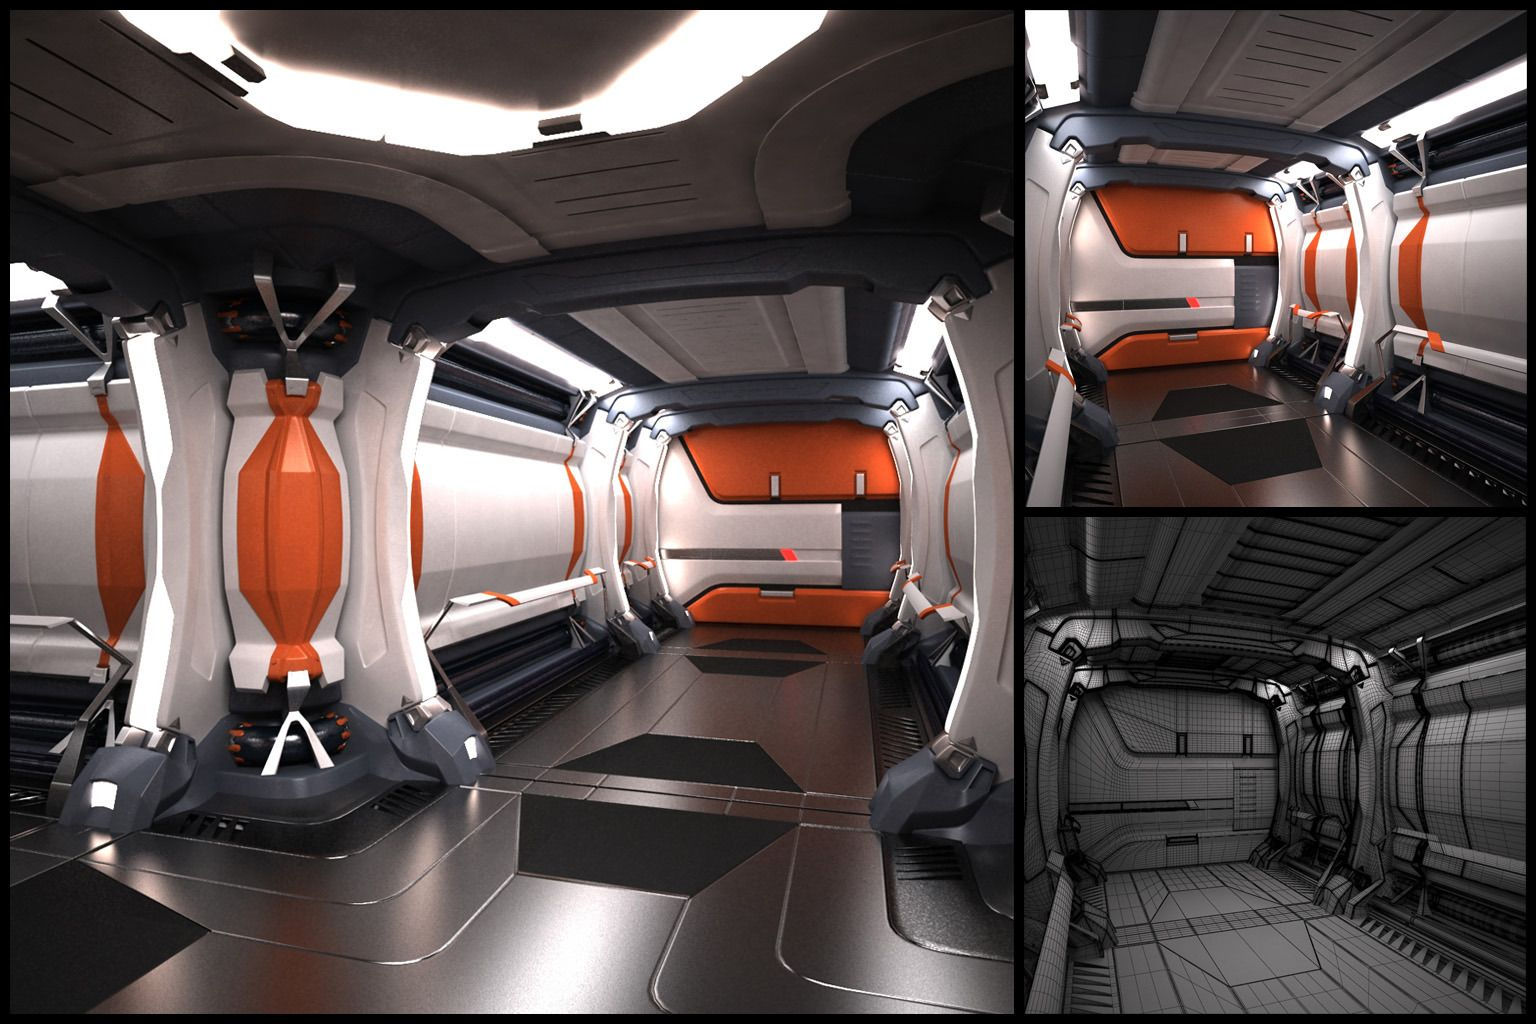 sci fi corridor futuristic interior futuristic architecture spaceship interior et science. Black Bedroom Furniture Sets. Home Design Ideas